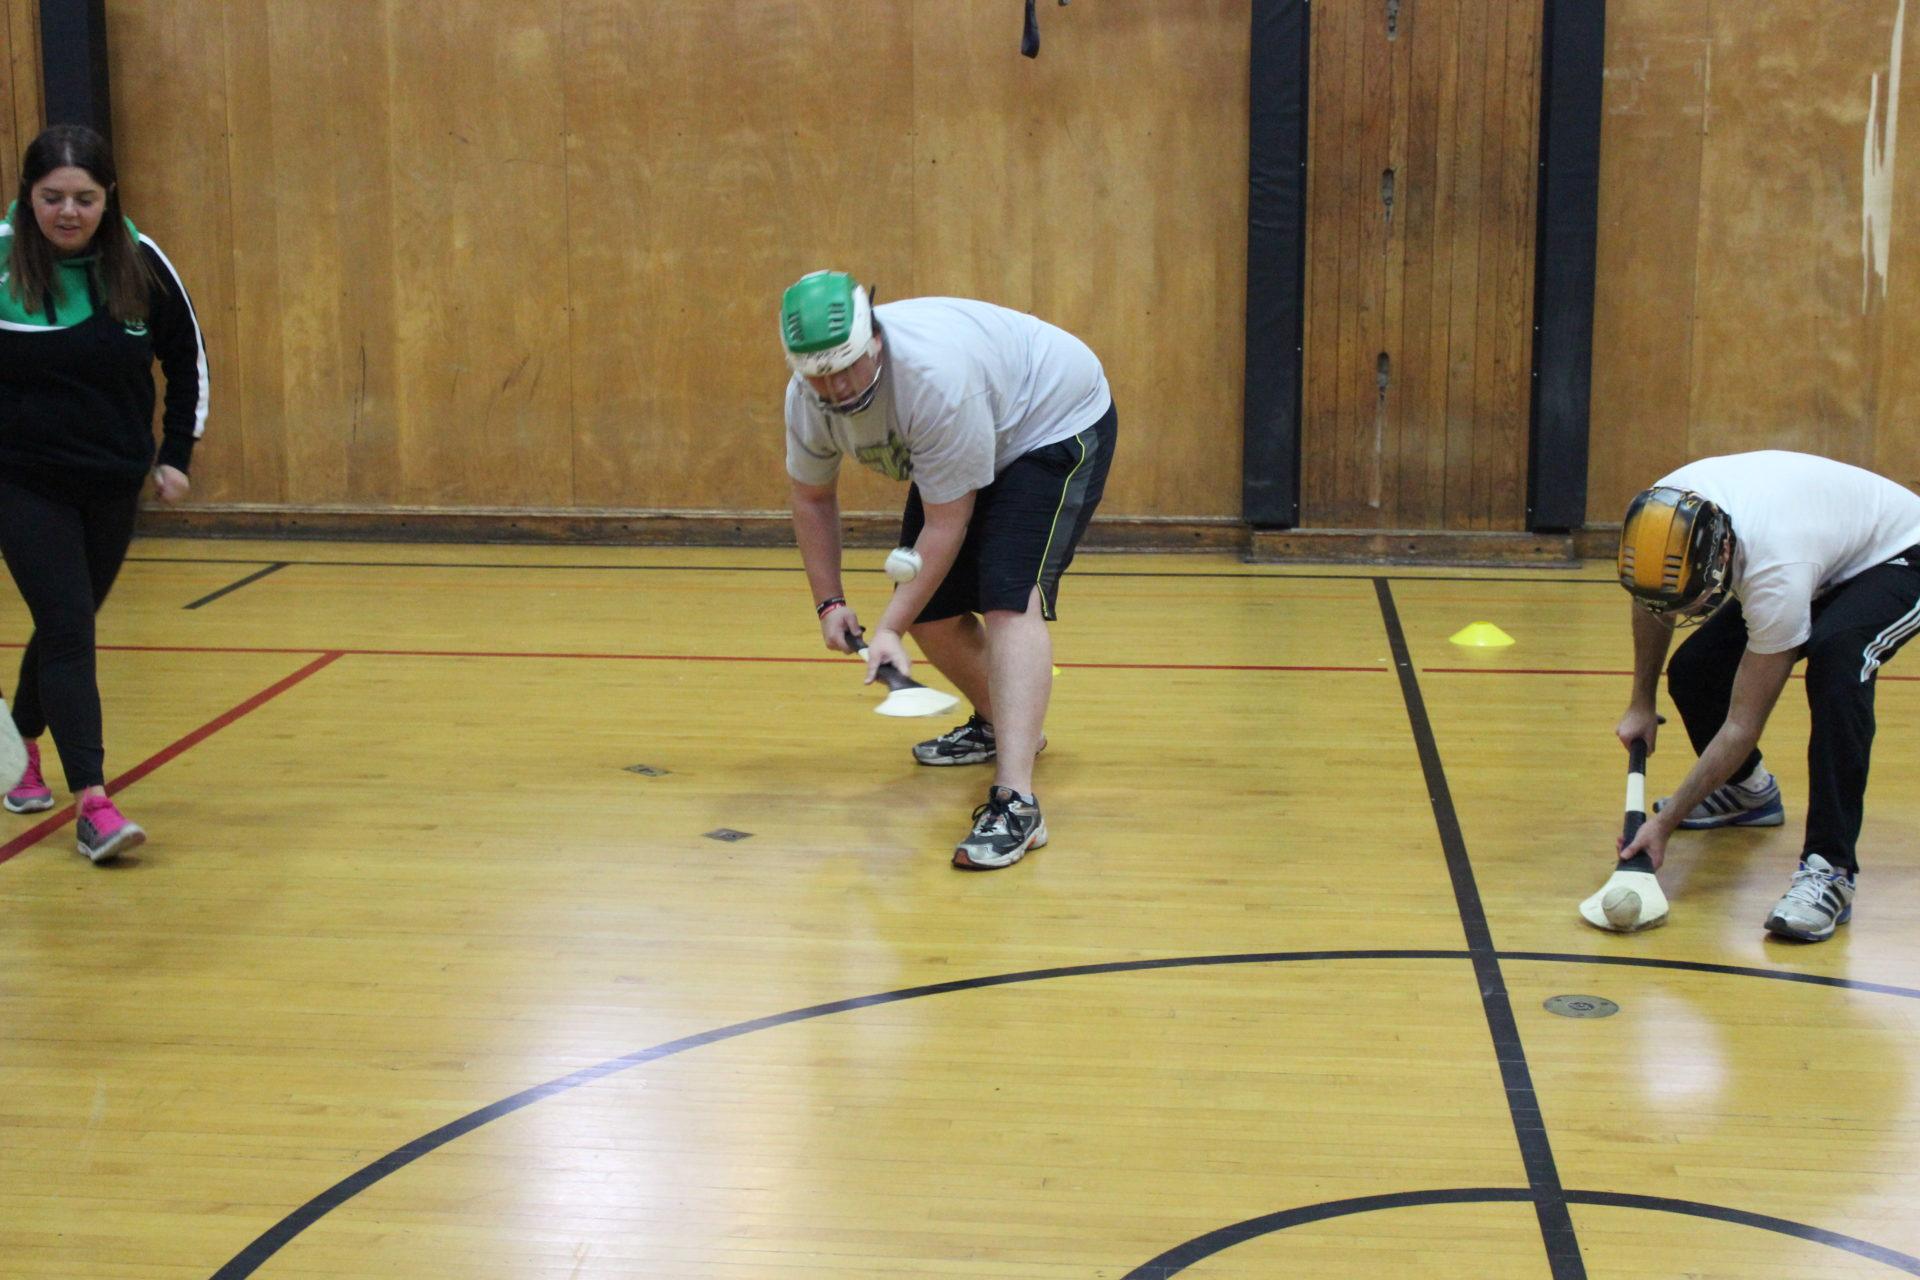 UofT Hurling Lessons roll lifting